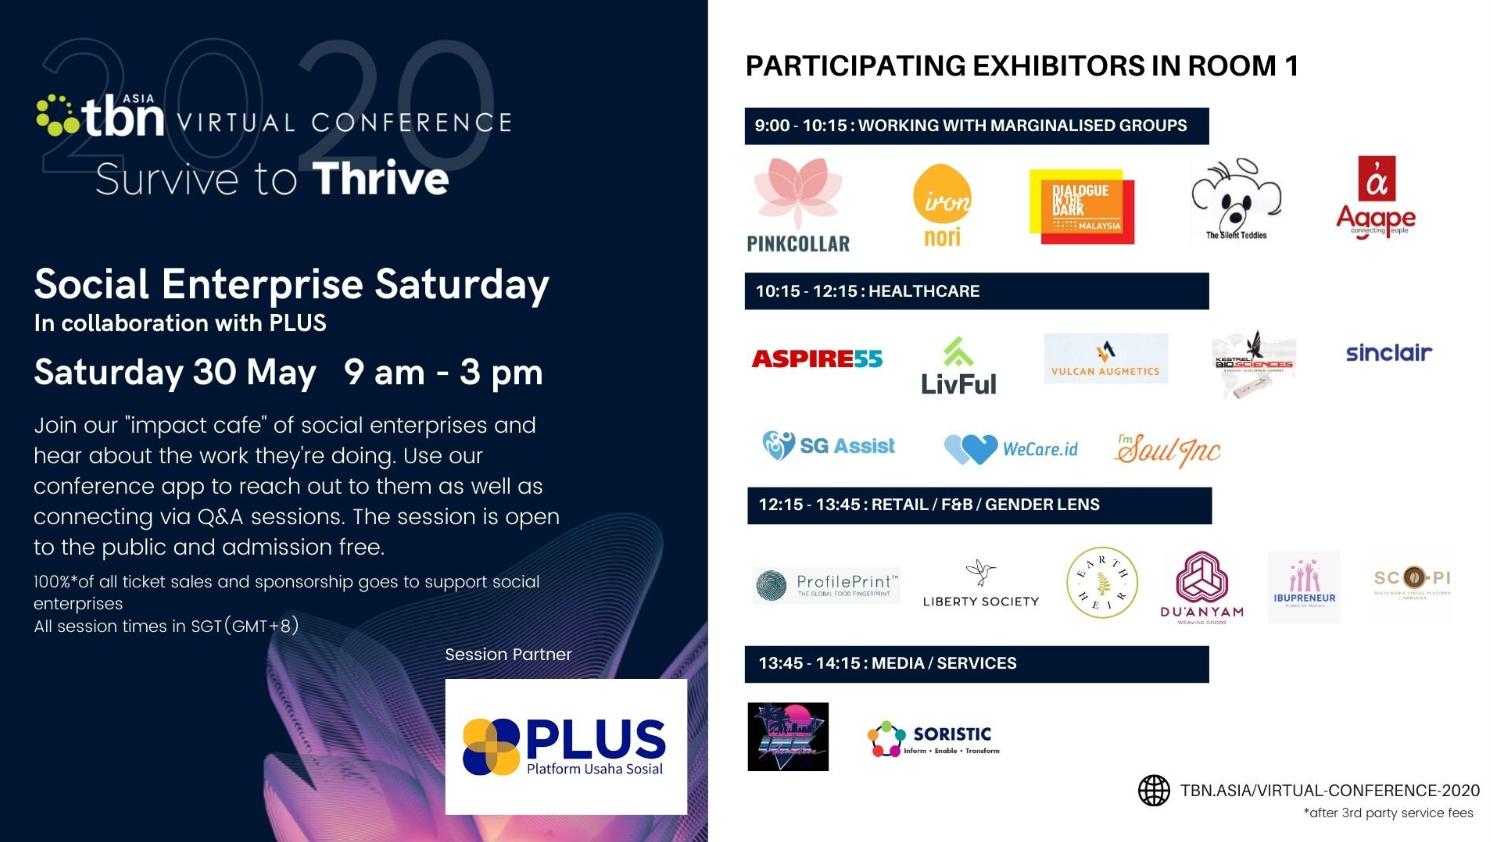 TBN Asia Conference 2020: Social Enterprise Saturday